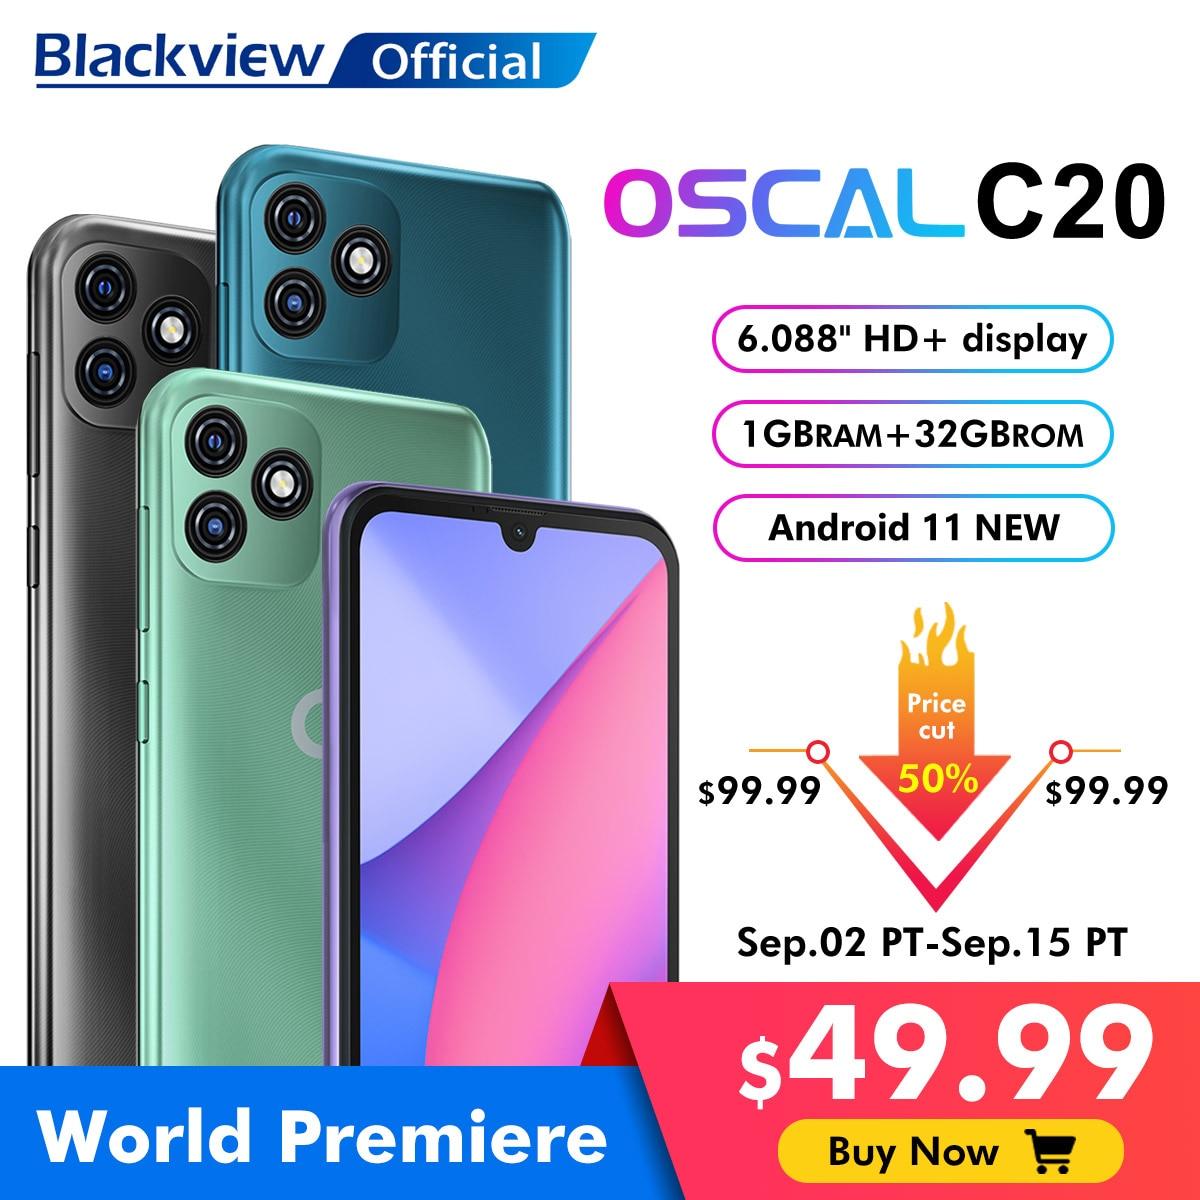 "BLACKVIEW OSCAL C20 Smartphone 1GB+32GB 6.088"" Cellphone 3380mAh Dual Camera Android 11 3G Mobile Phone Face Unlock Celular"